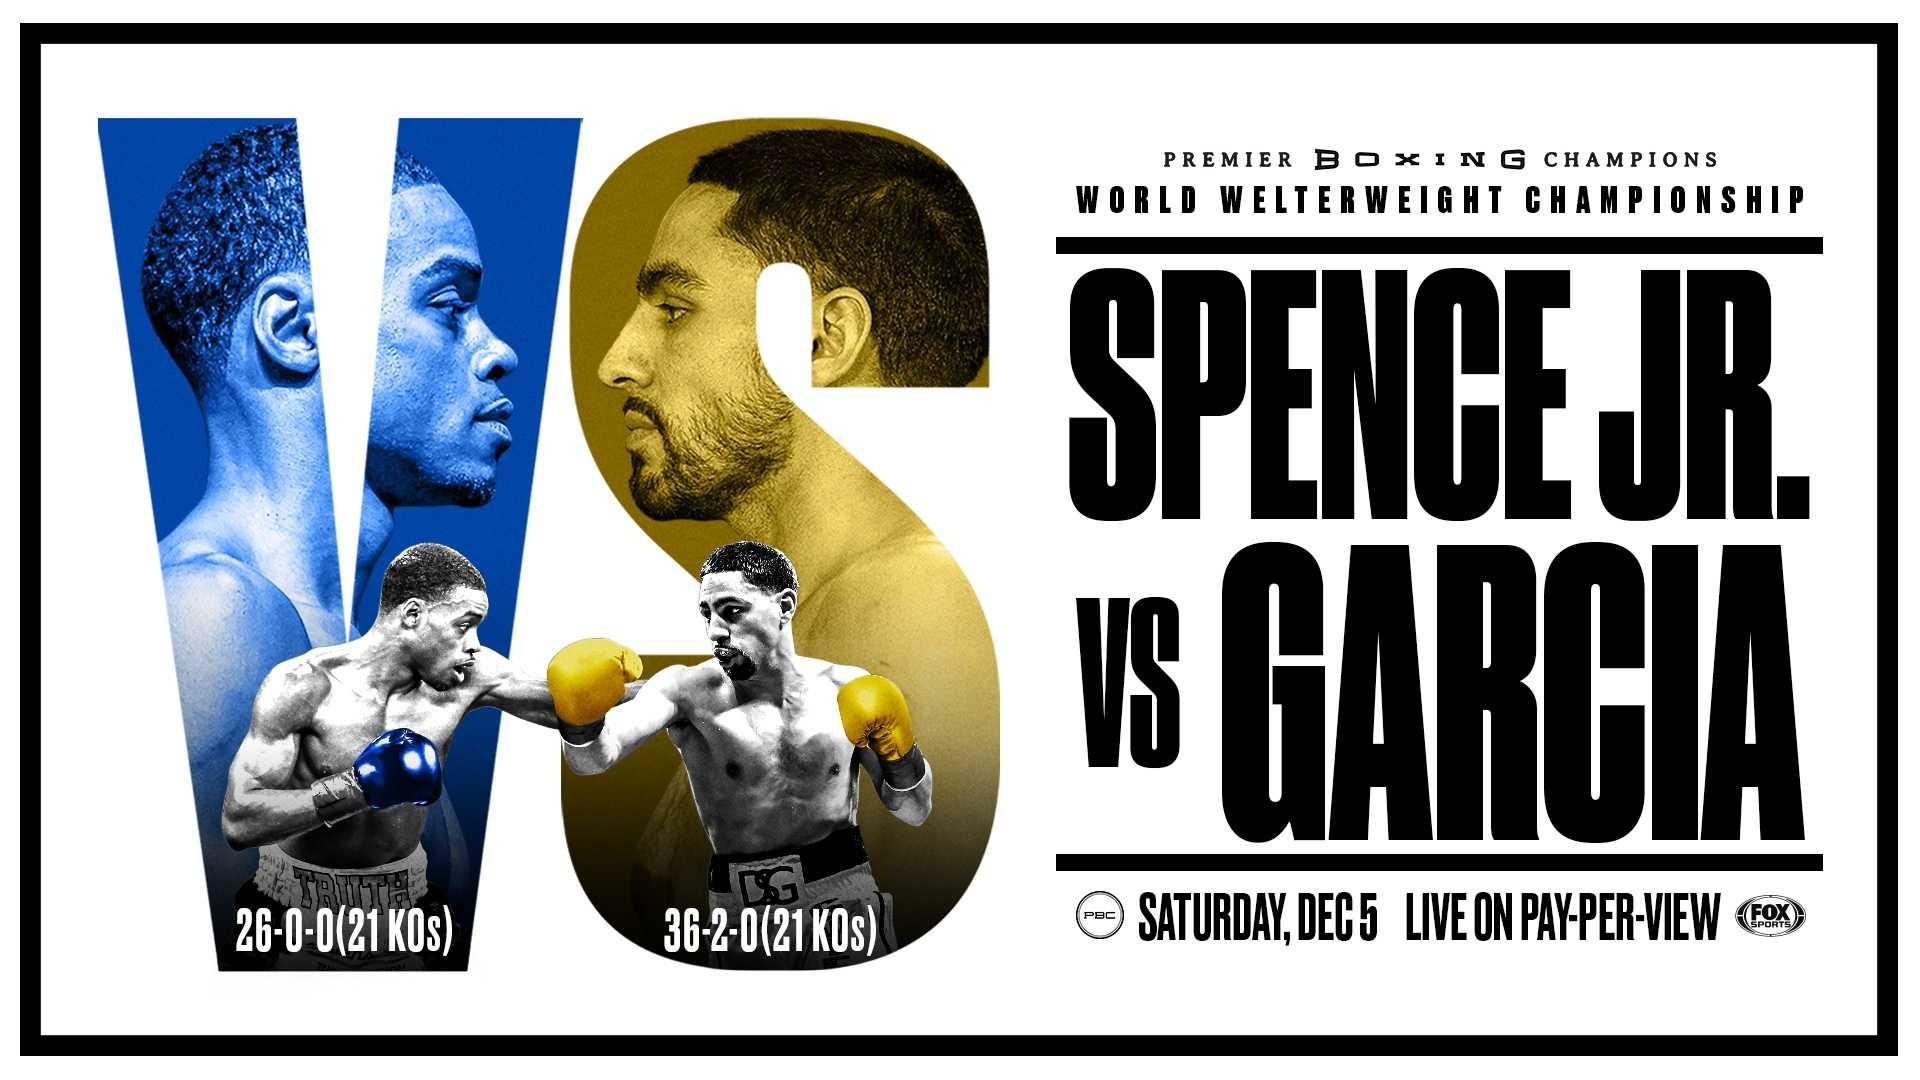 Errol Spence Jr vs. Danny Garcia live on PPV tonight